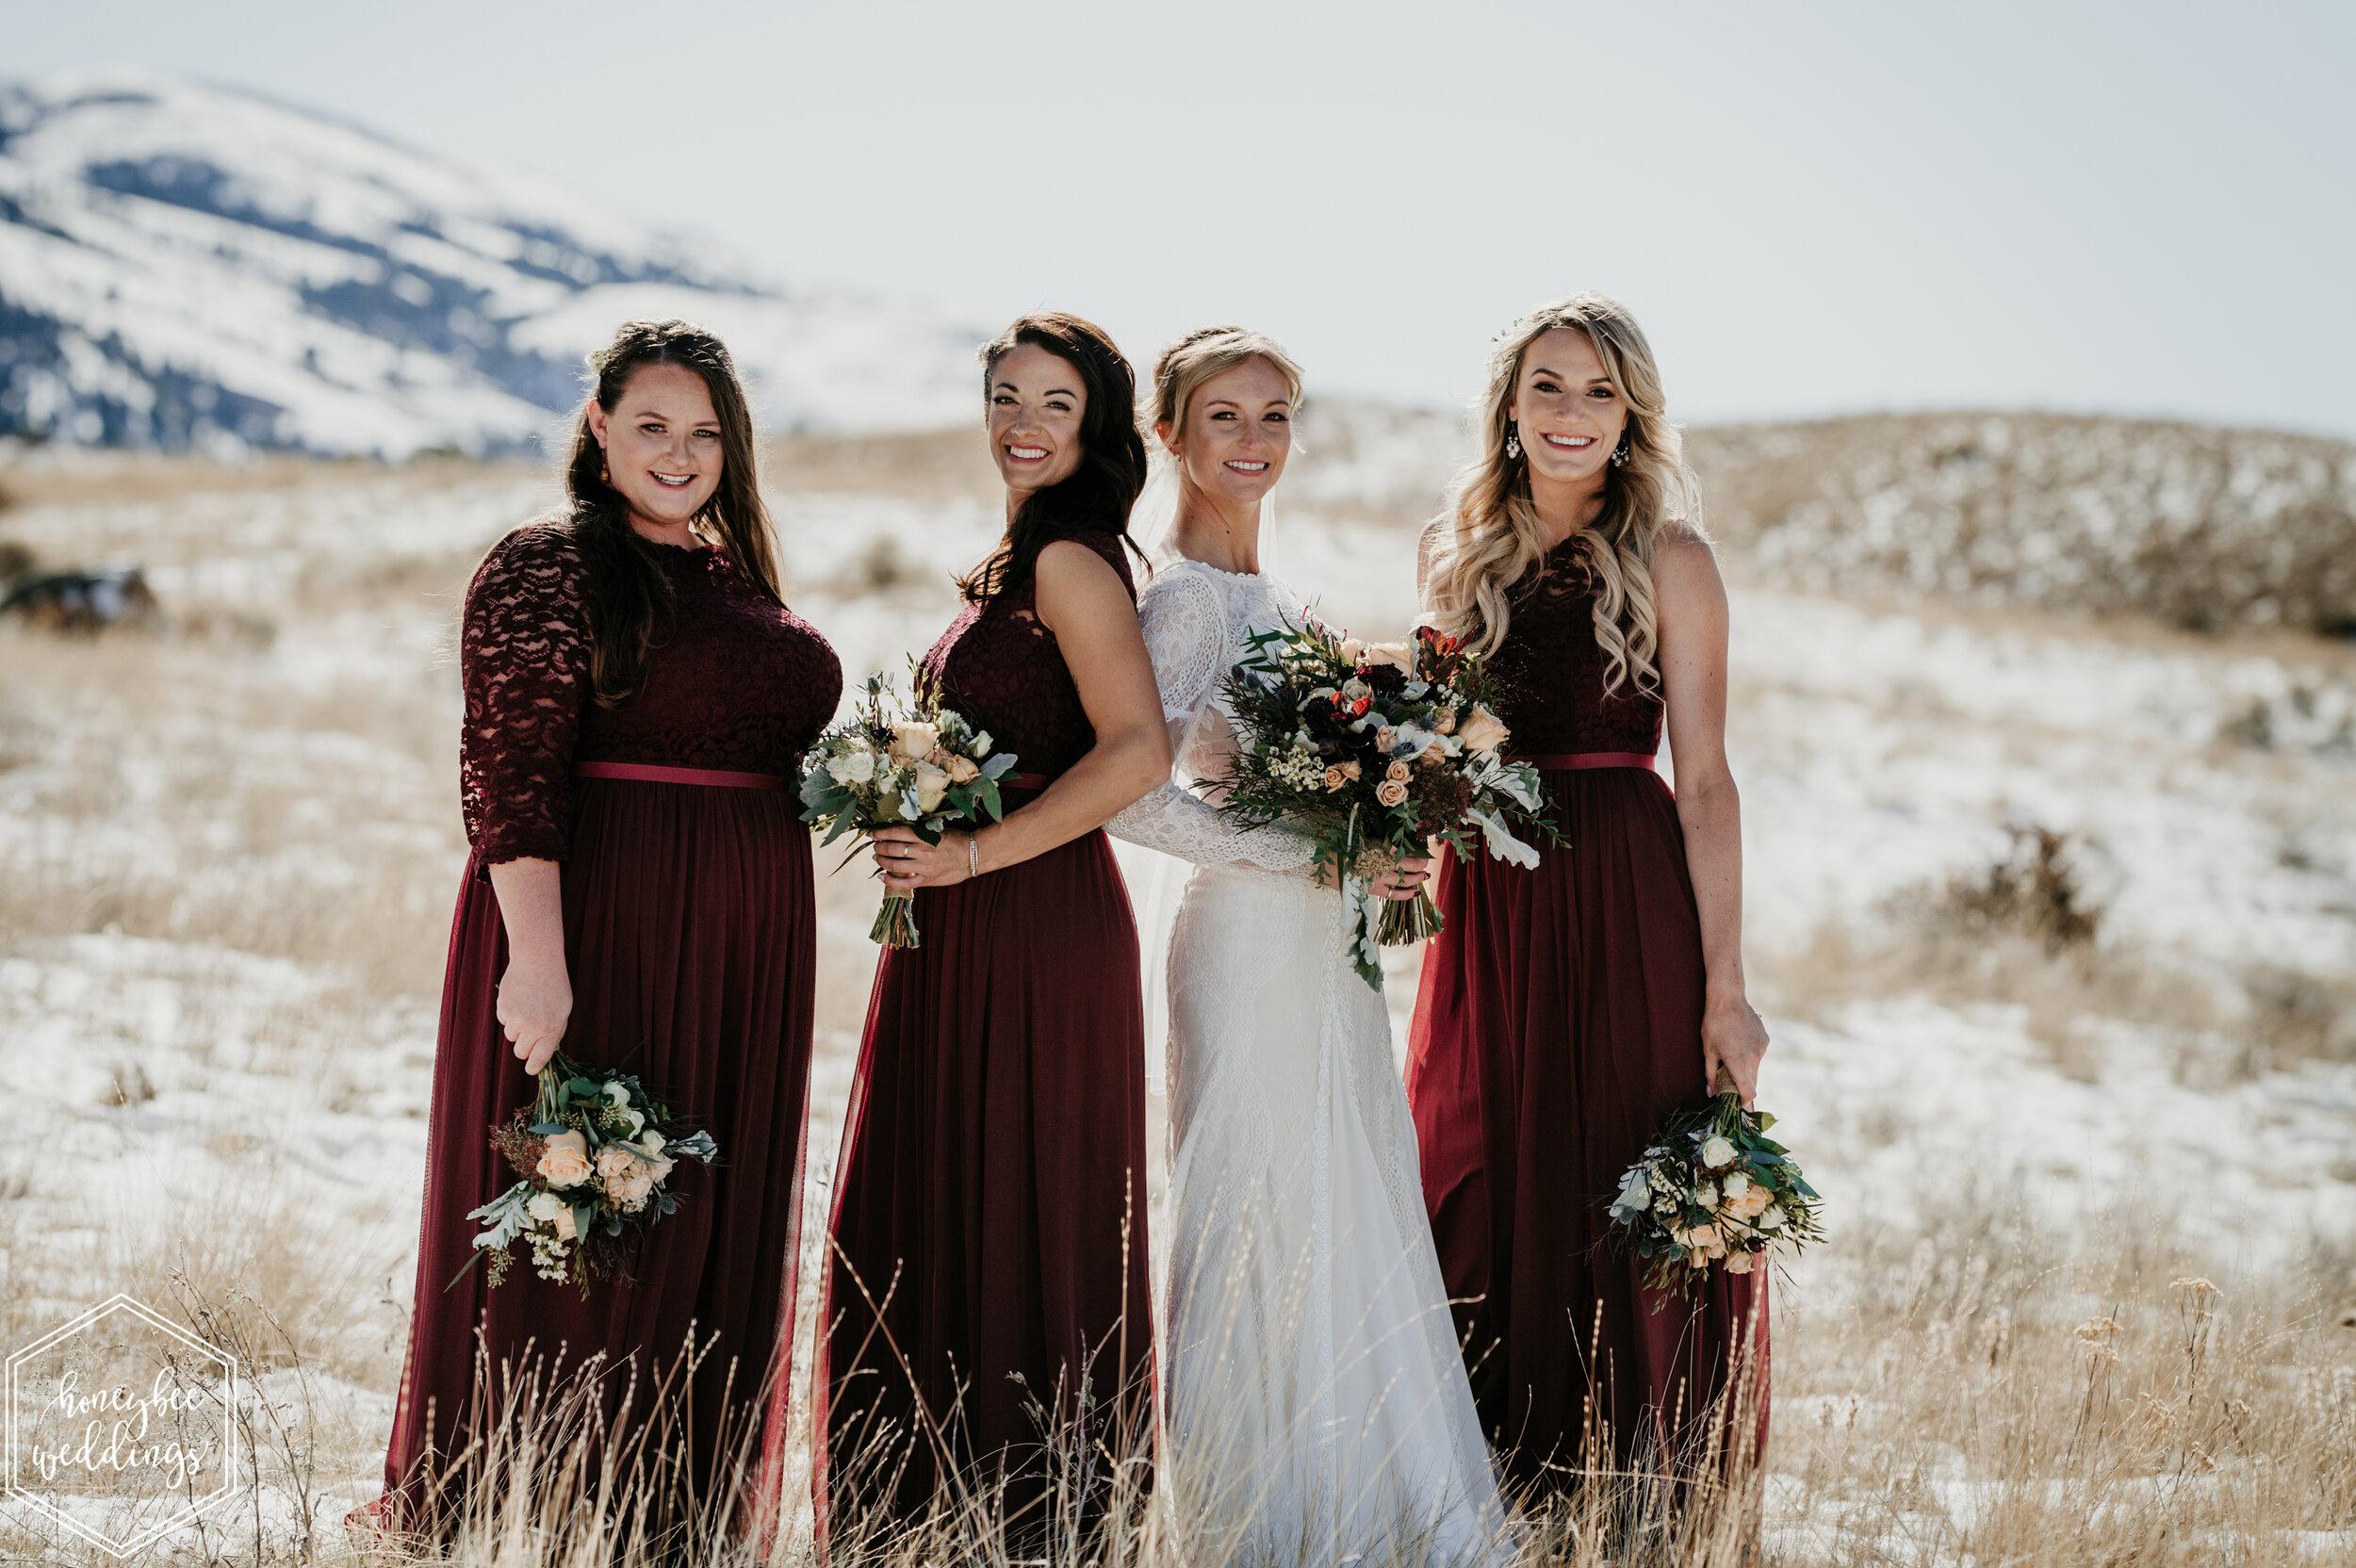 115Chico Hot Springs Wedding_Montana Wedding Photographer_Winter Wedding_Ariel & Richard_October 12, 2019-235.jpg